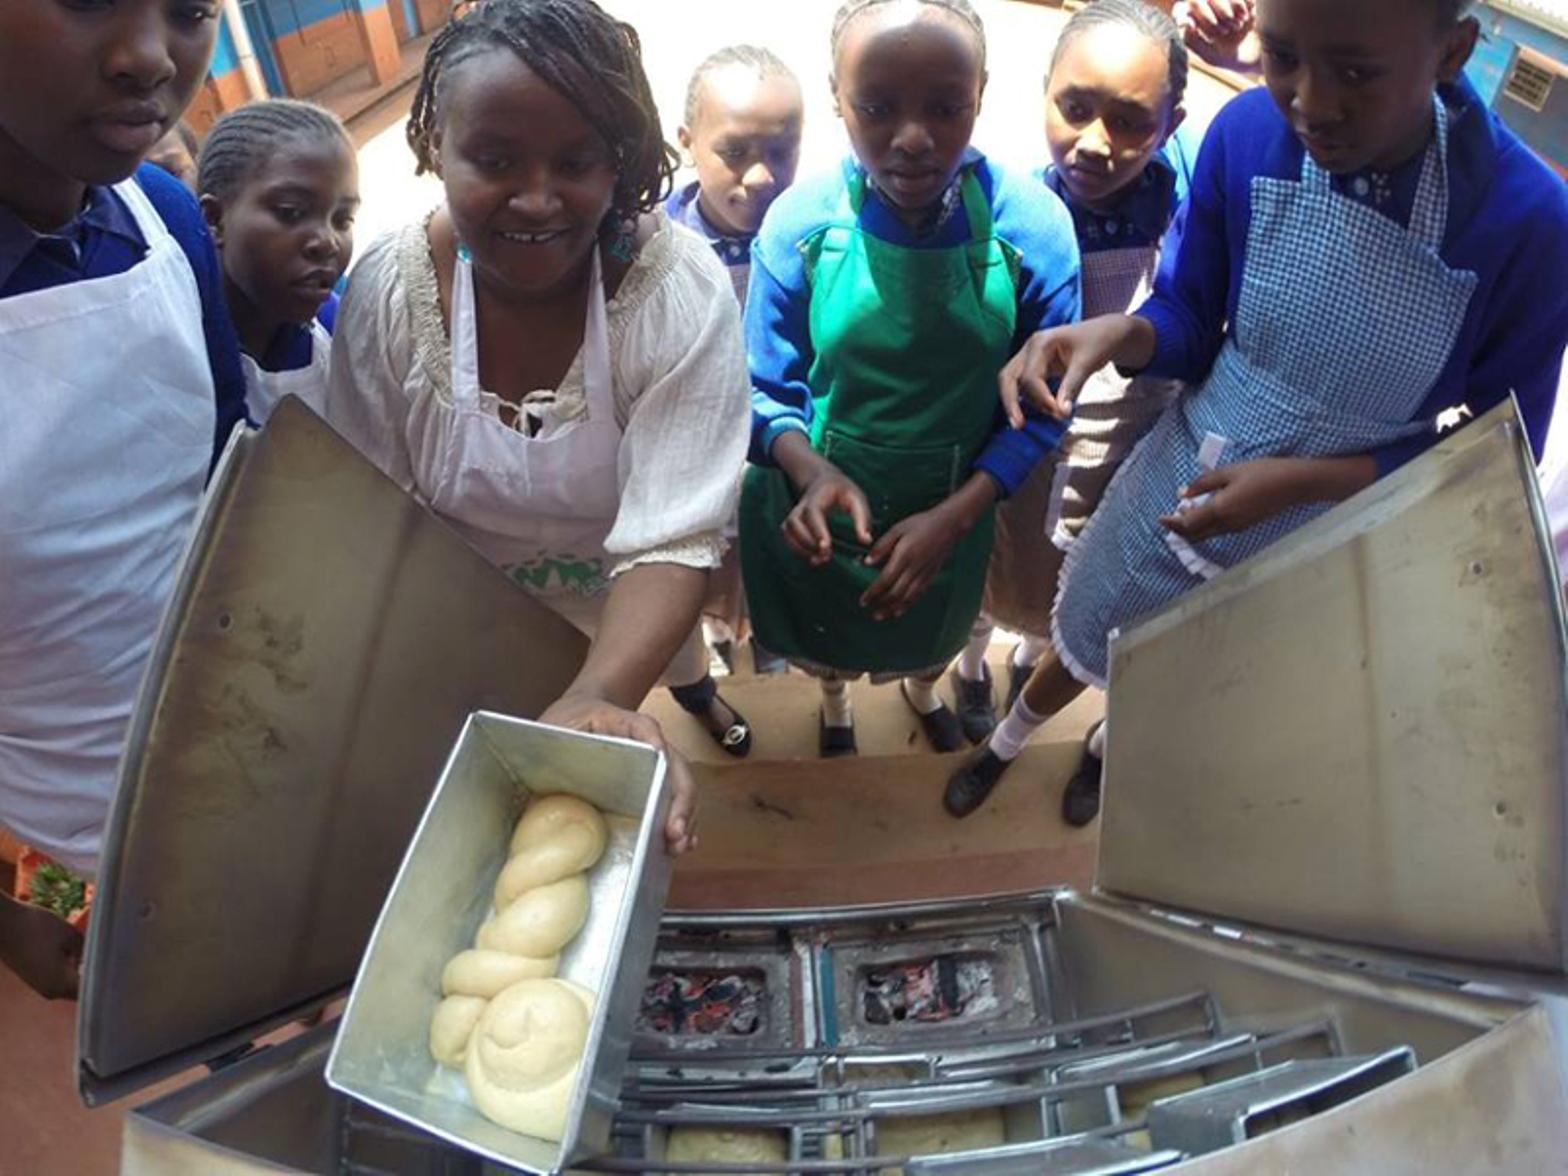 Baking bread at Farasi Lane Primary School. Photo courtesy of MASHAV